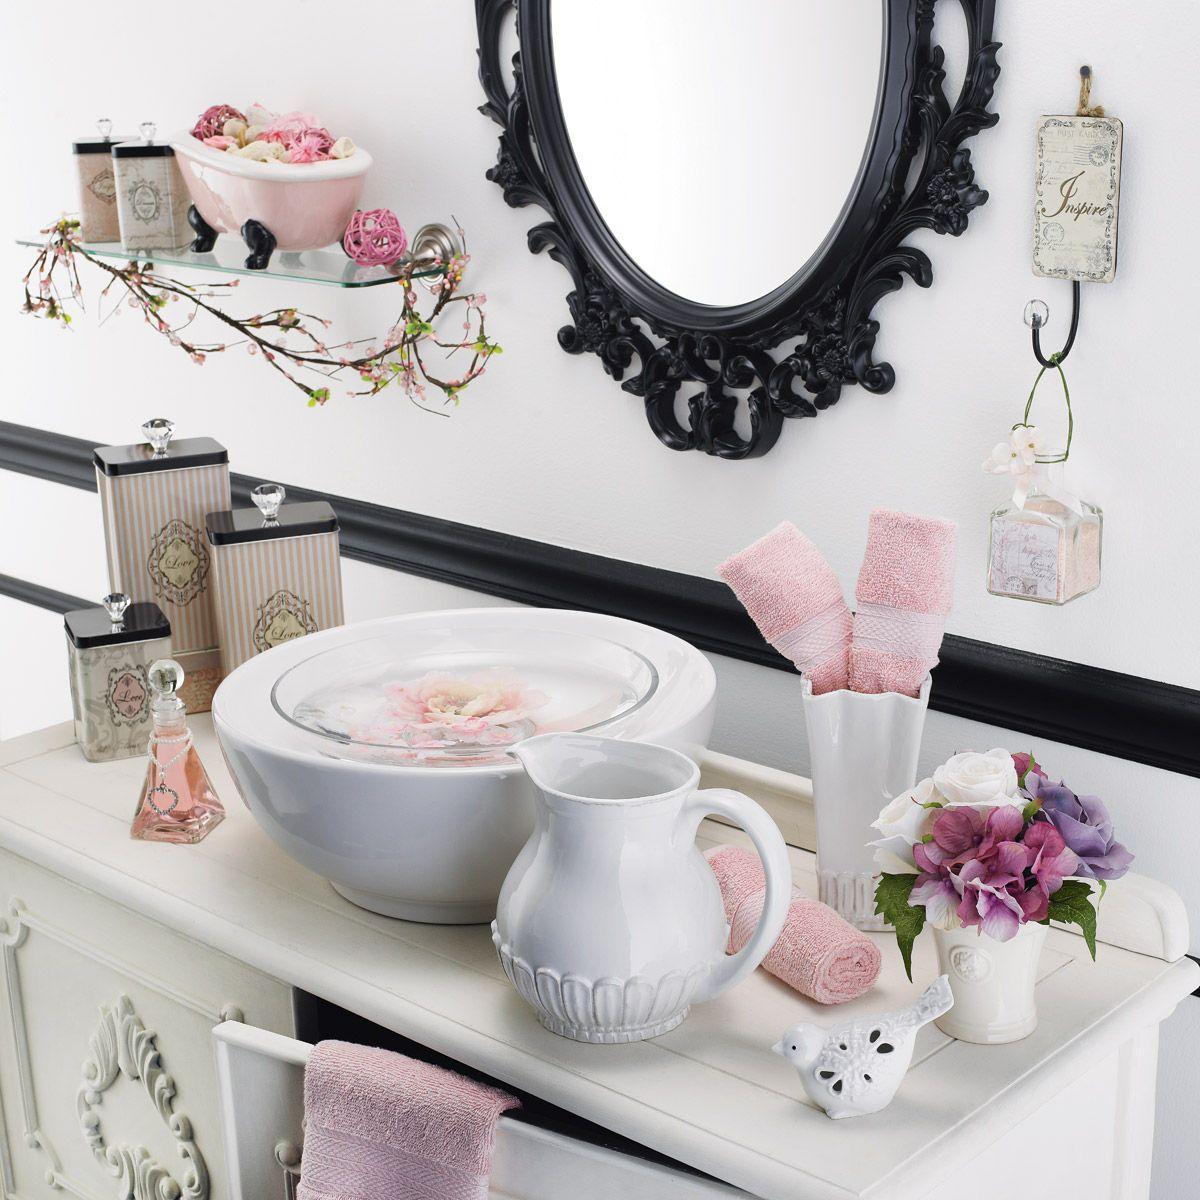 Ashland Parisian collection at micheals (also love that mirror ...